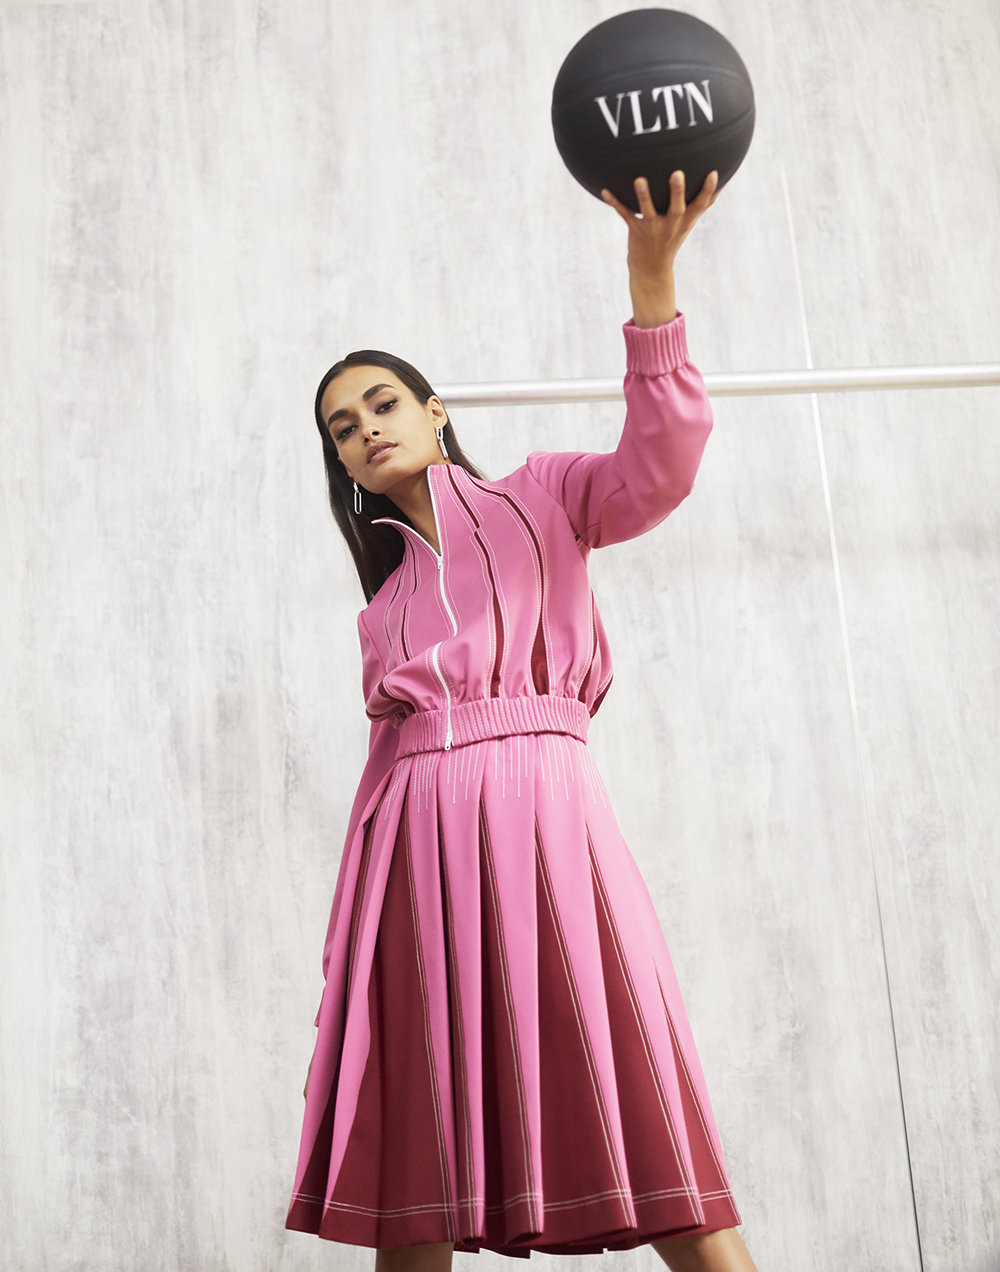 Vogue_Valentino_2020 copy.jpg